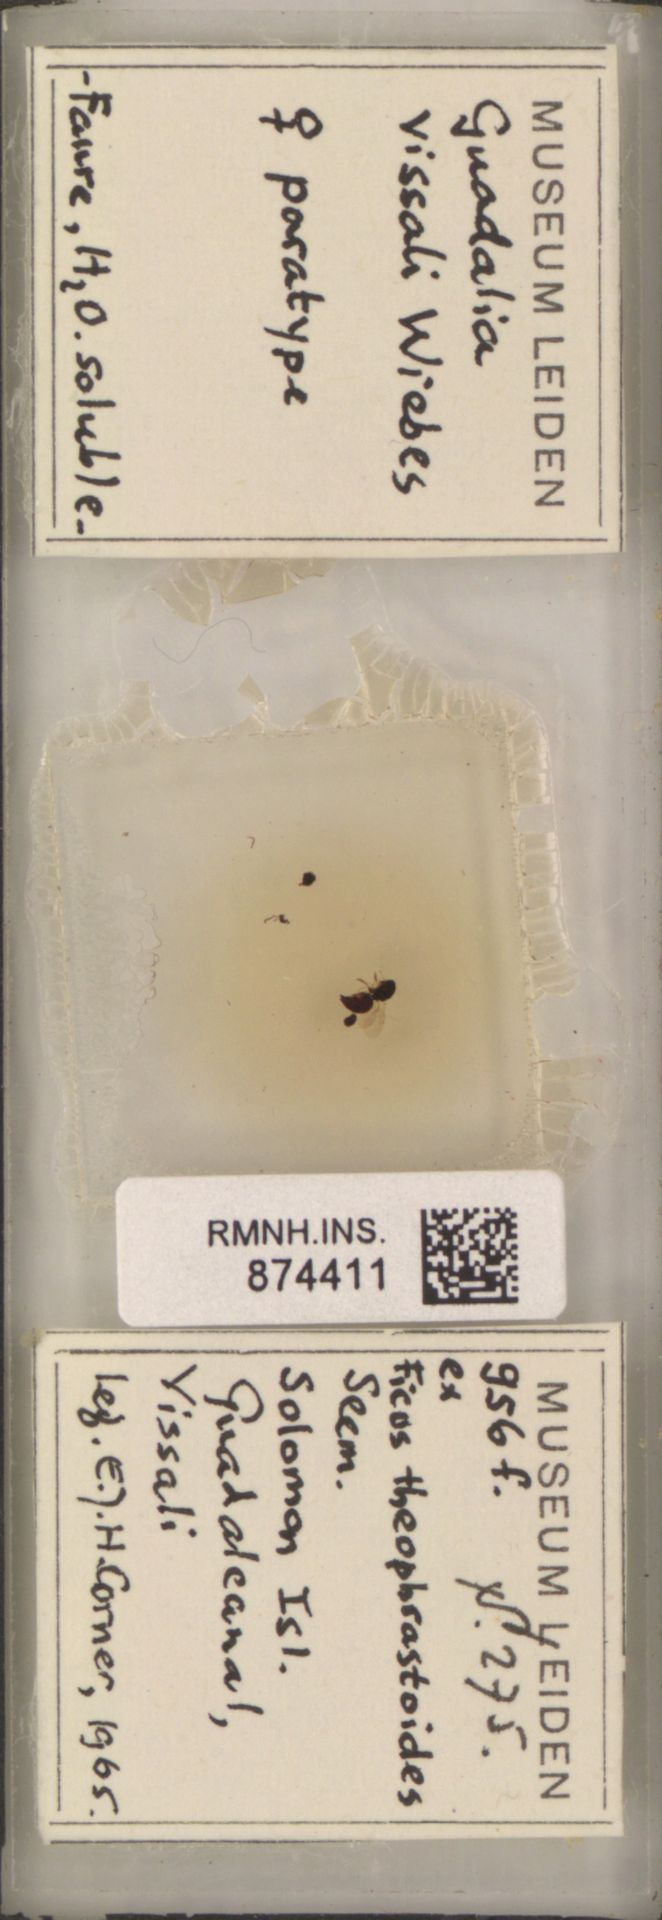 RMNH.INS.874411 | Guadalia vissali Wiebes